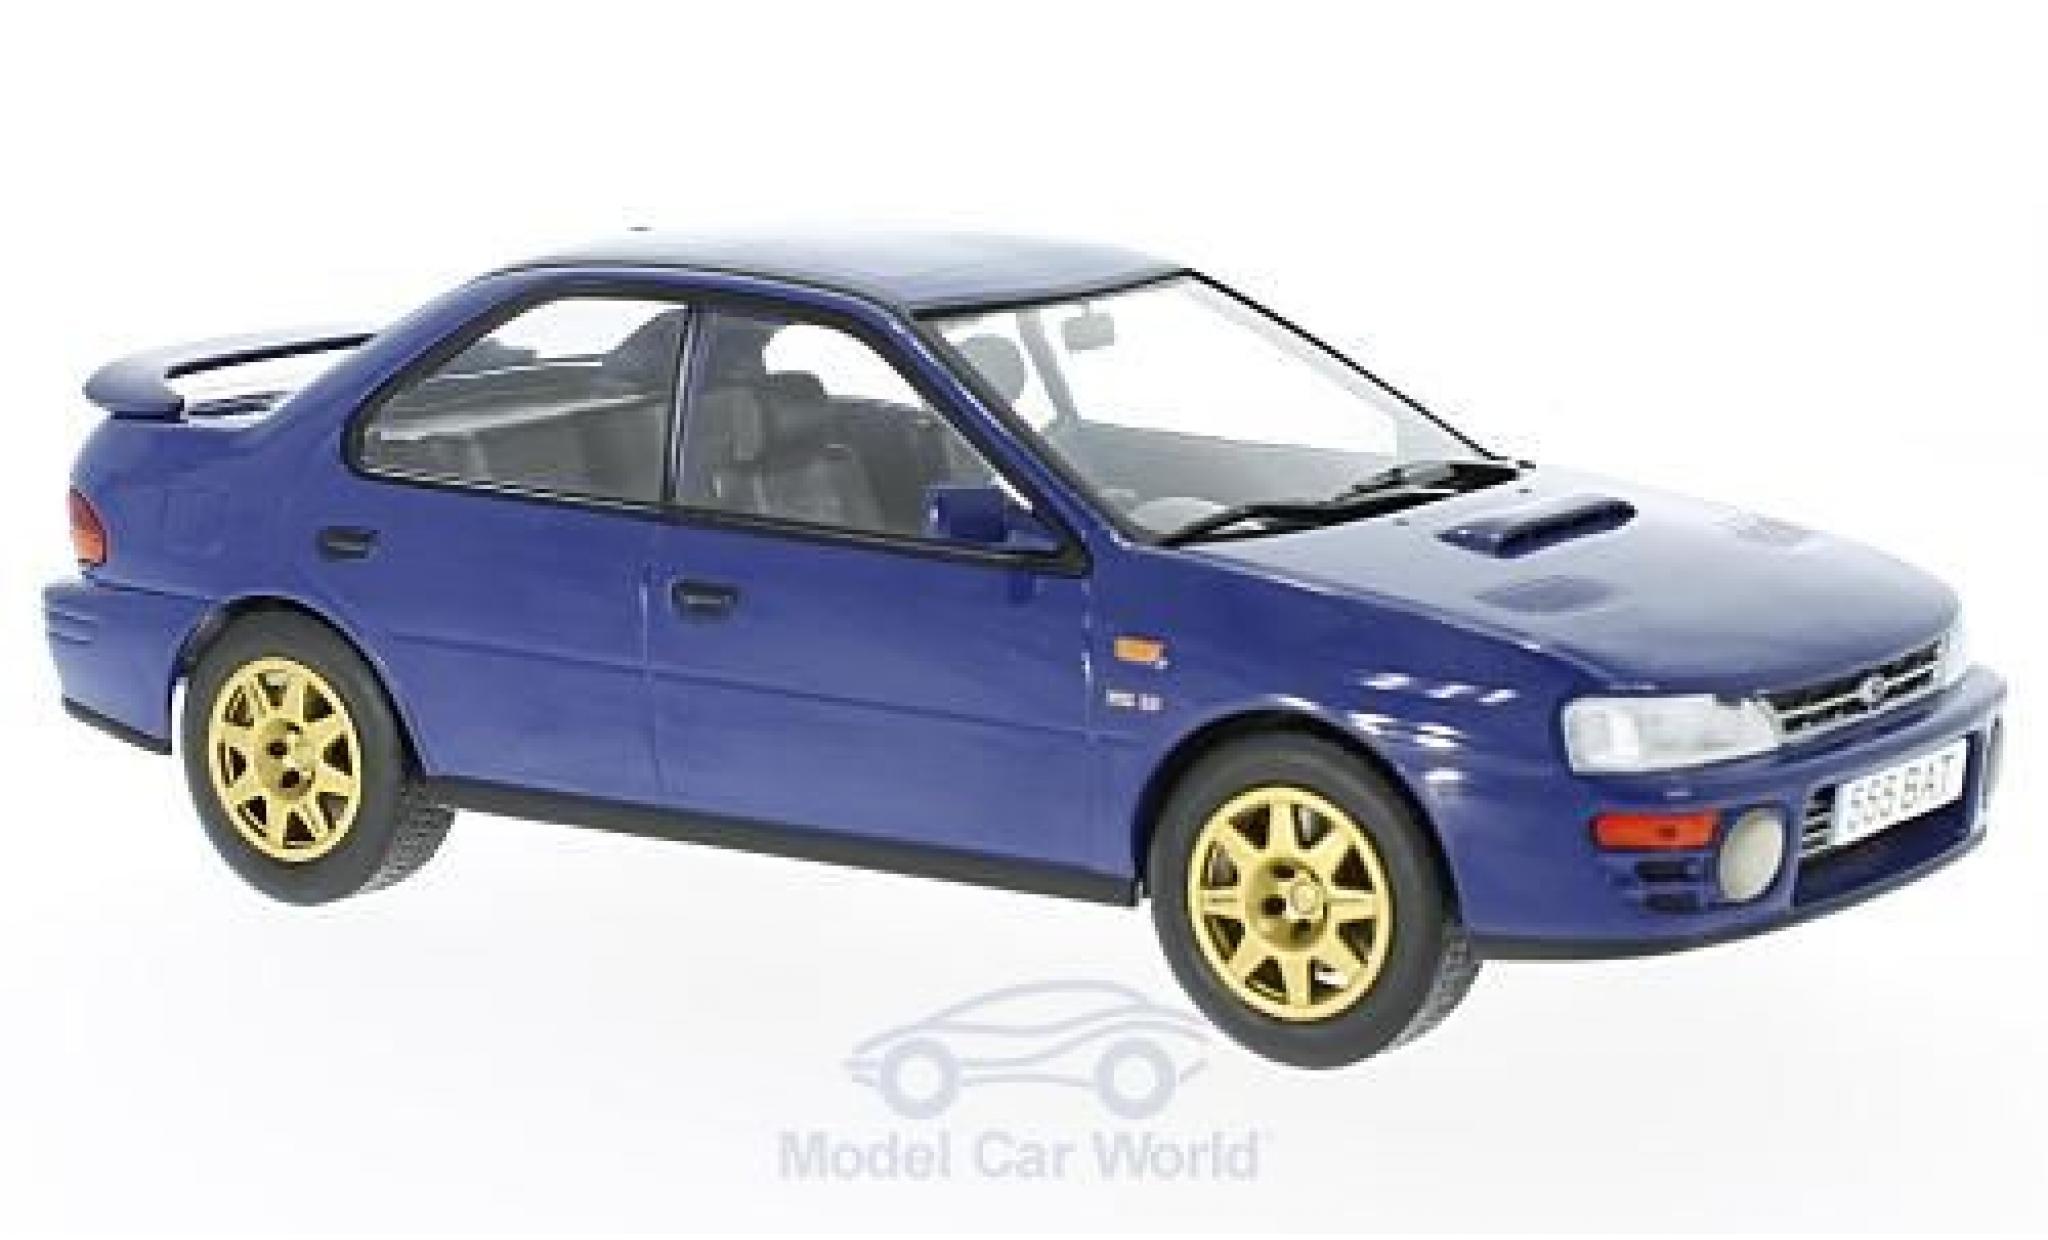 Subaru Impreza WRX 1/18 IXO WRX blue RHD 1995